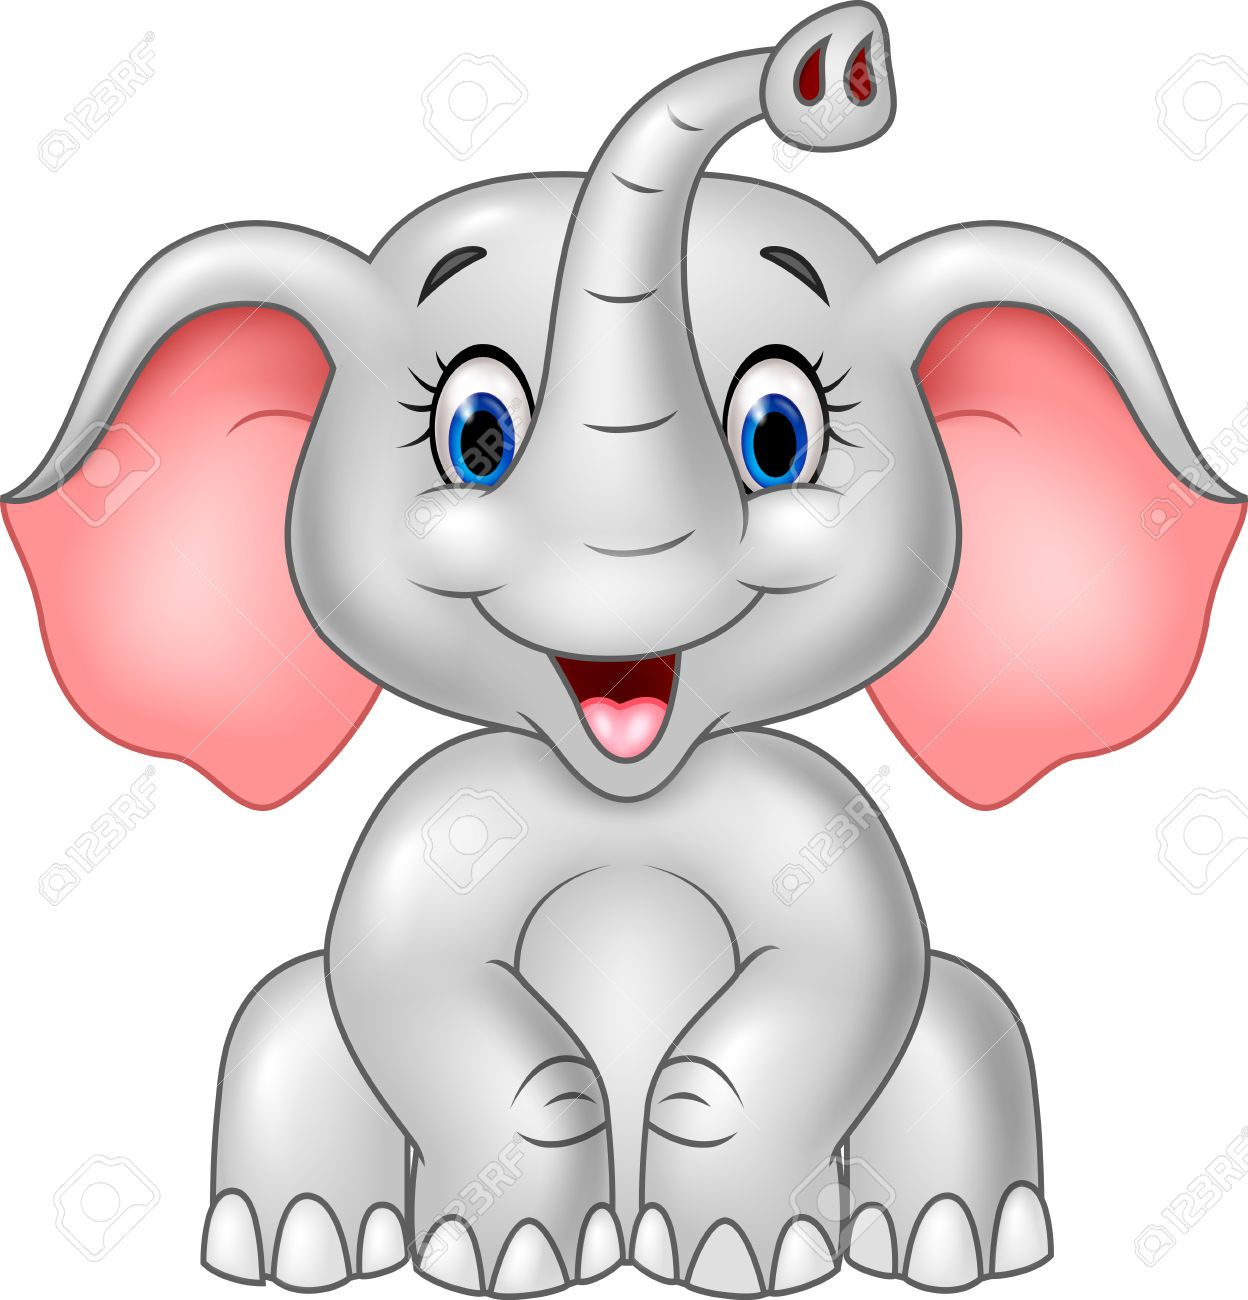 Vector Illustration Of Cartoon Cute Baby Elephant Isolated On Elephant Clip Art Cartoon Elephant Cute Baby Elephant